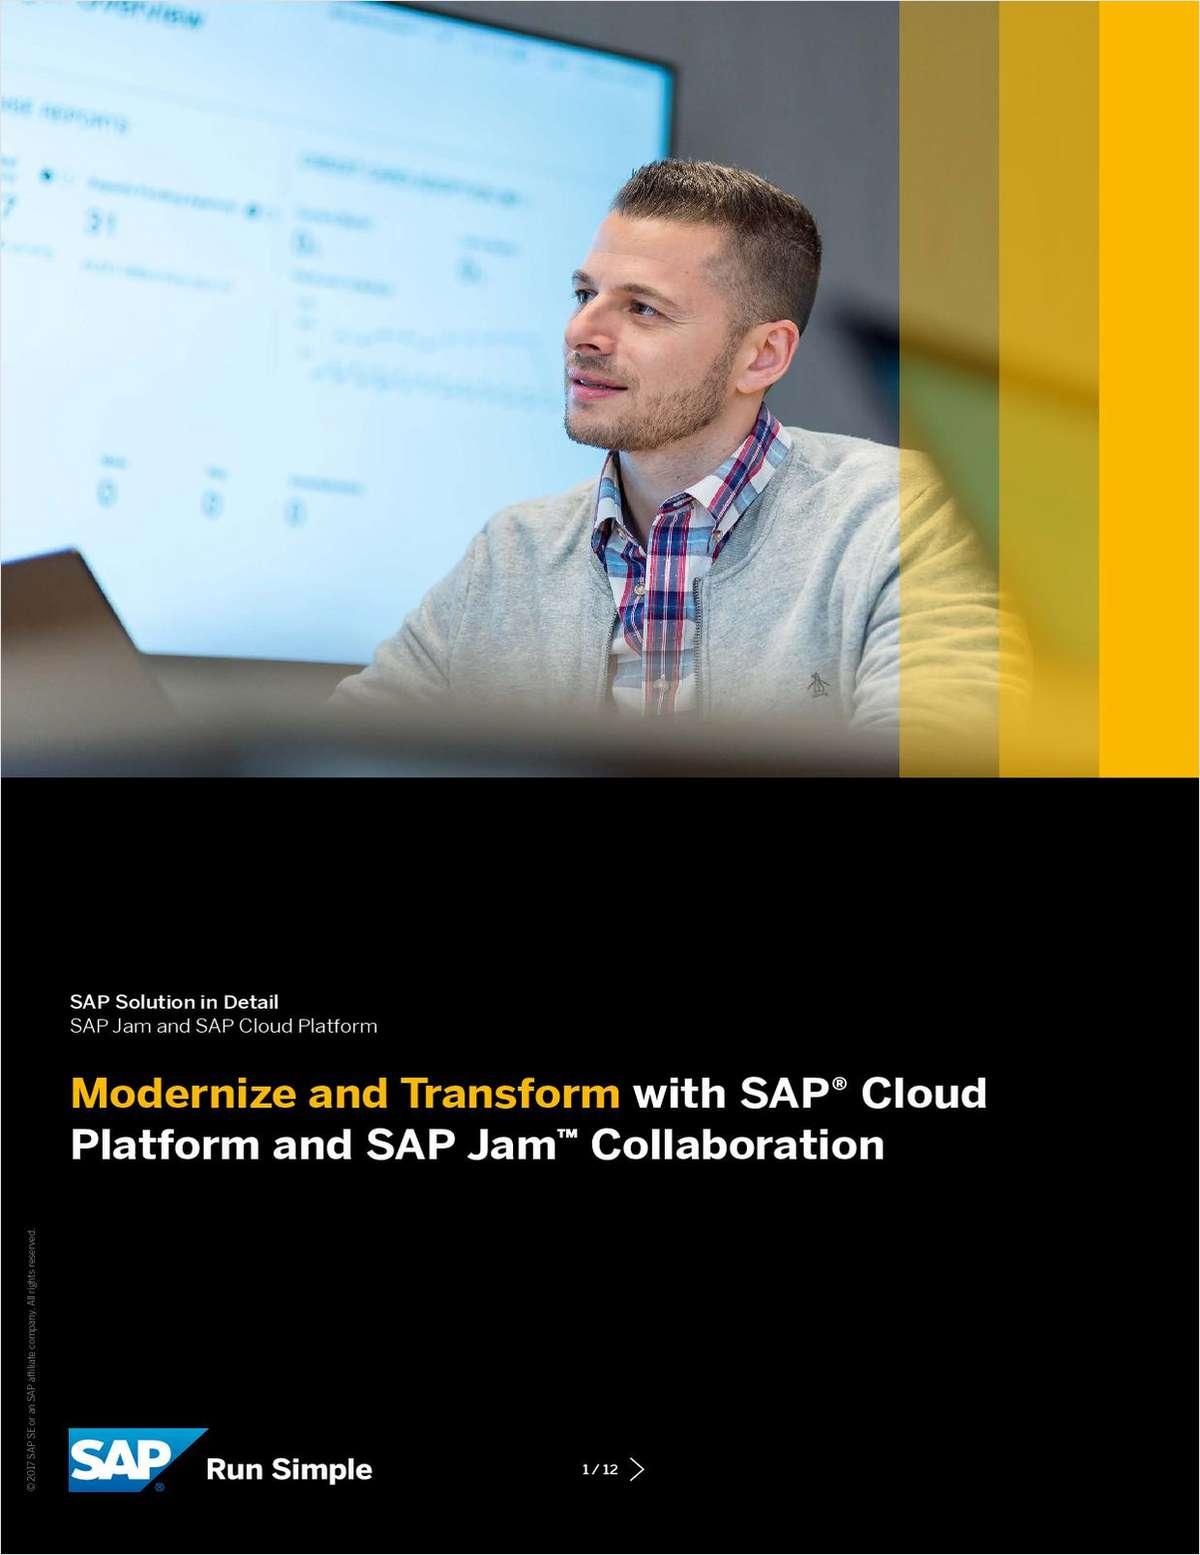 Modernize and Transform with SAP Cloud Platform and SAP Jam Collaboration